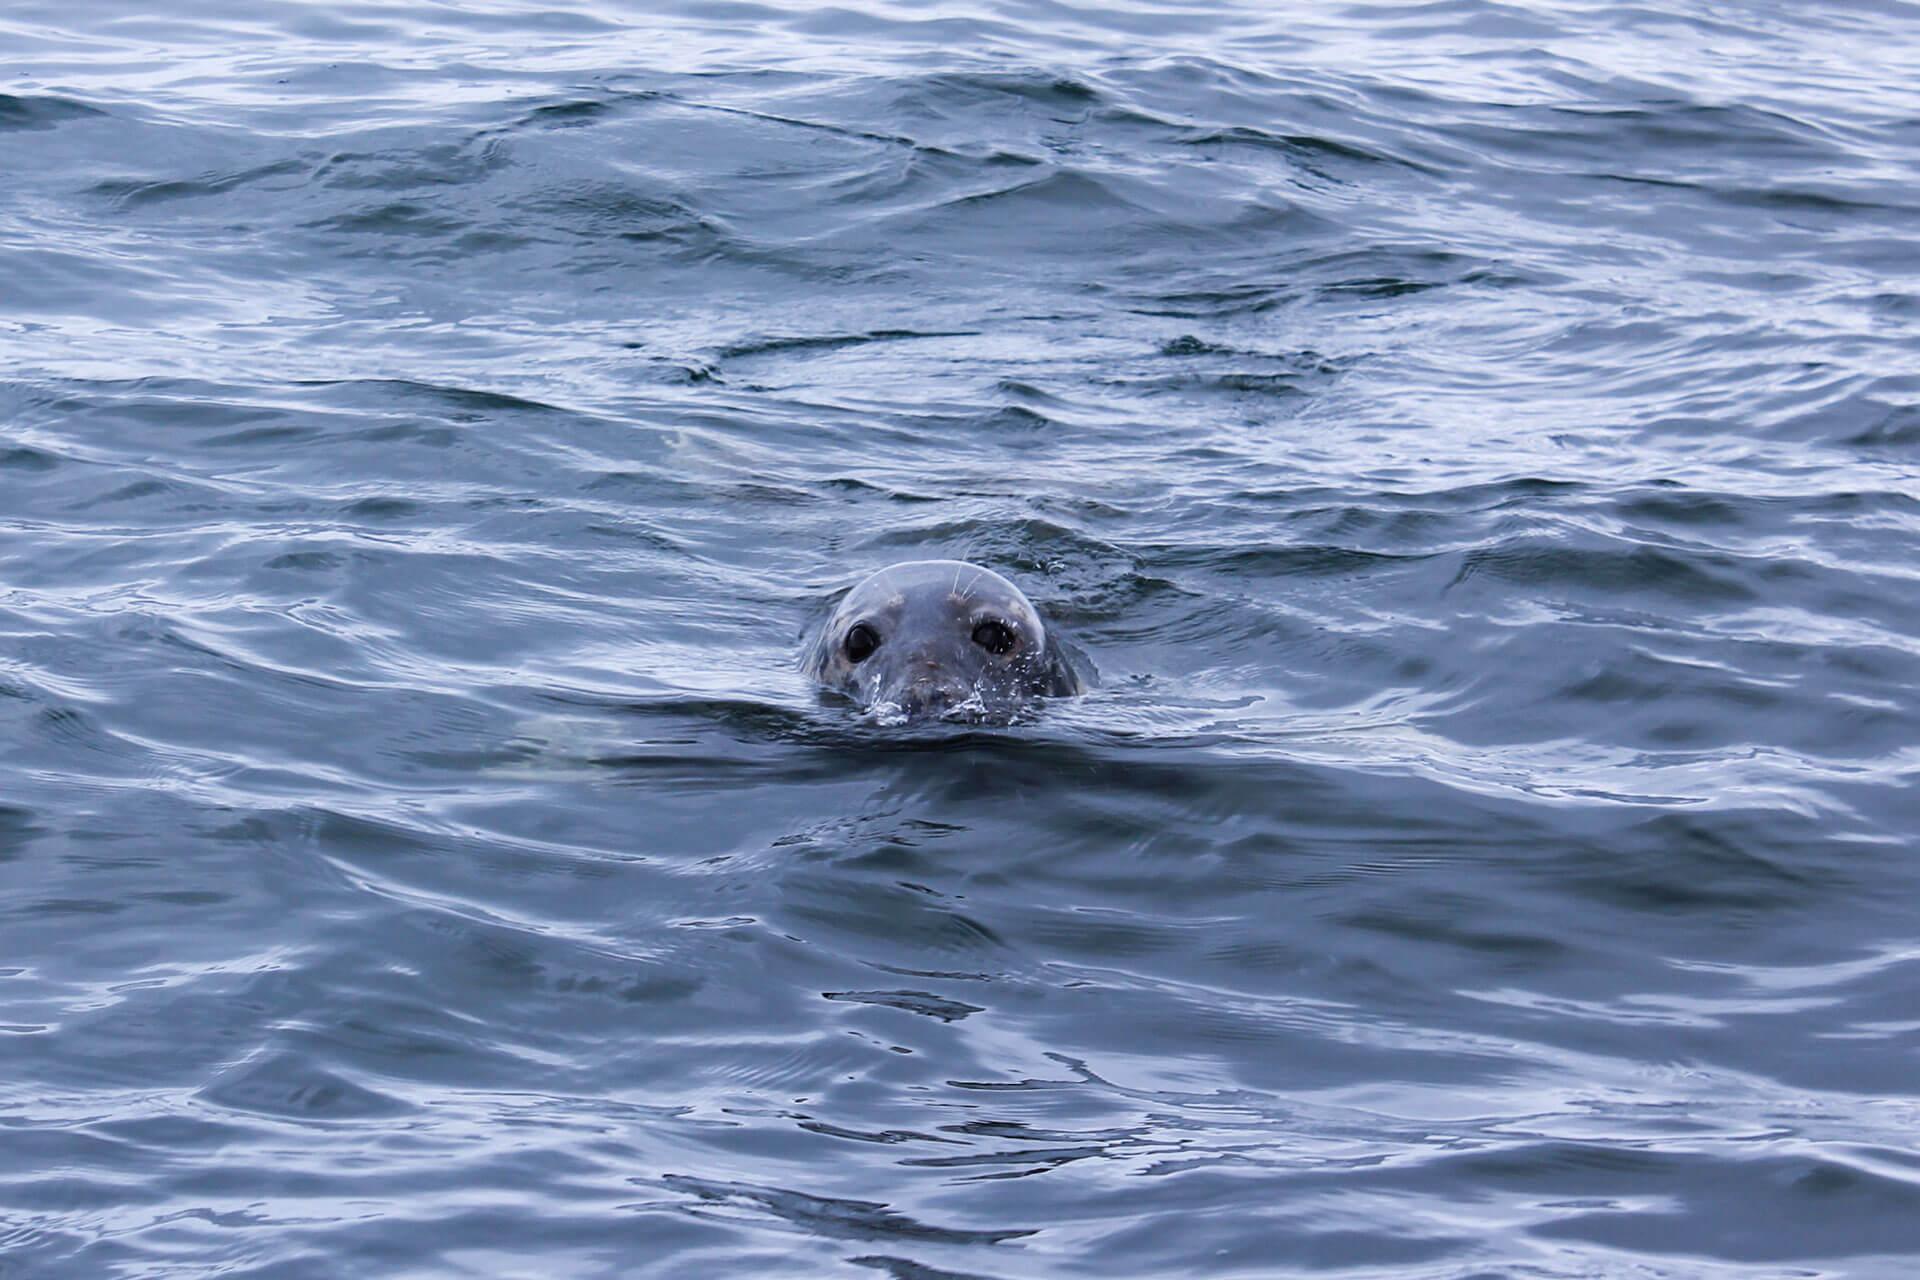 Seal-Gobbins